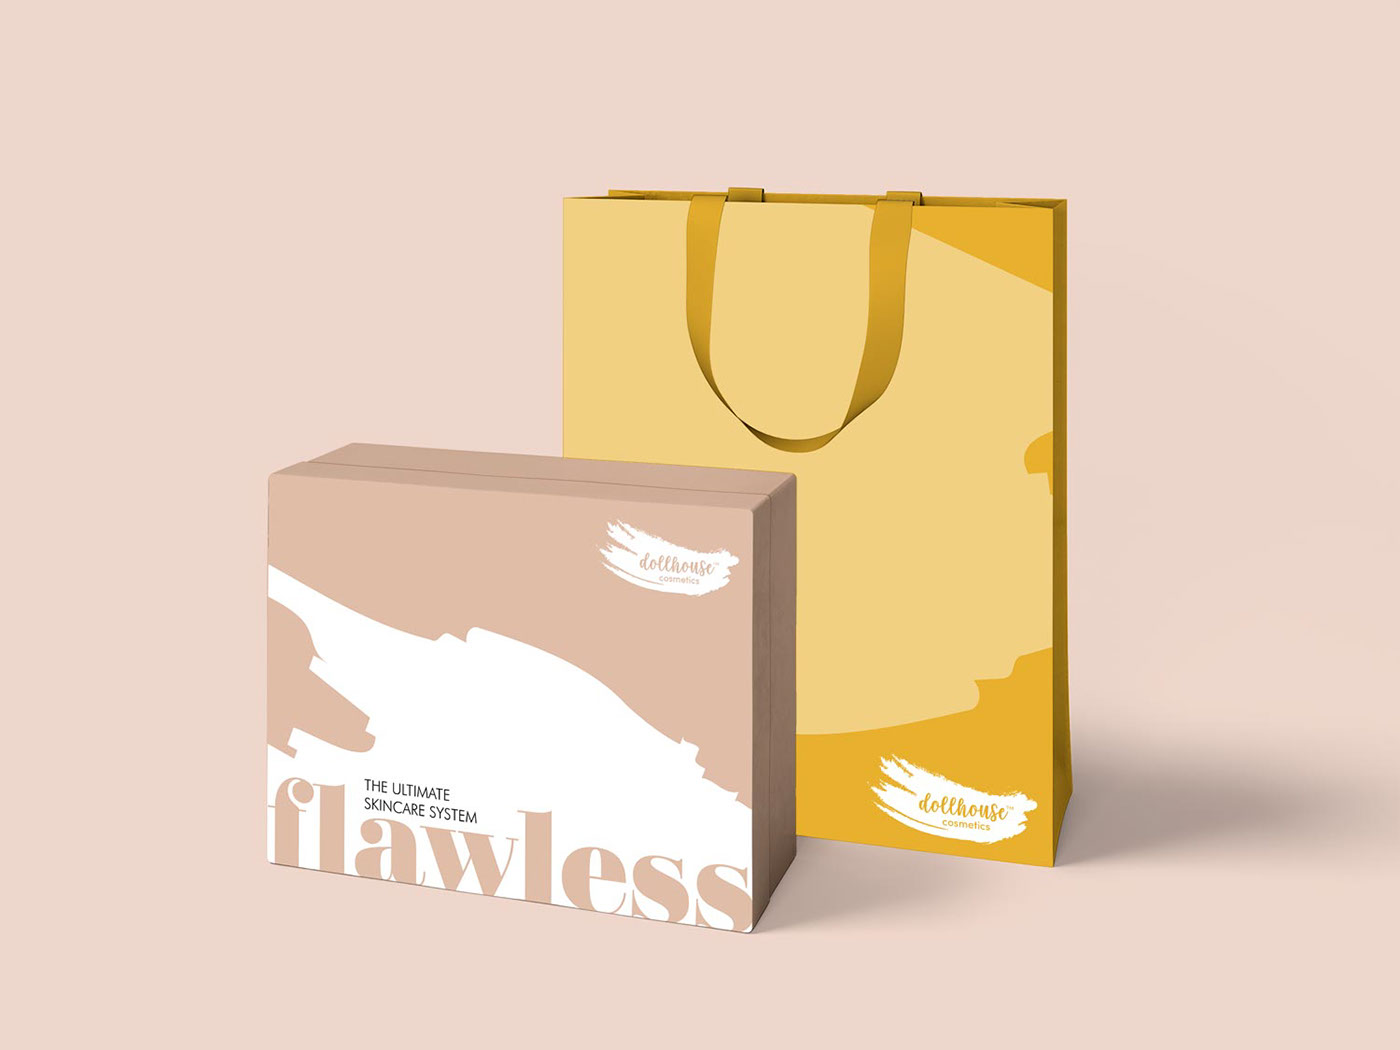 toya-design-co-dollhouse-cosmetics-packaging.jpg